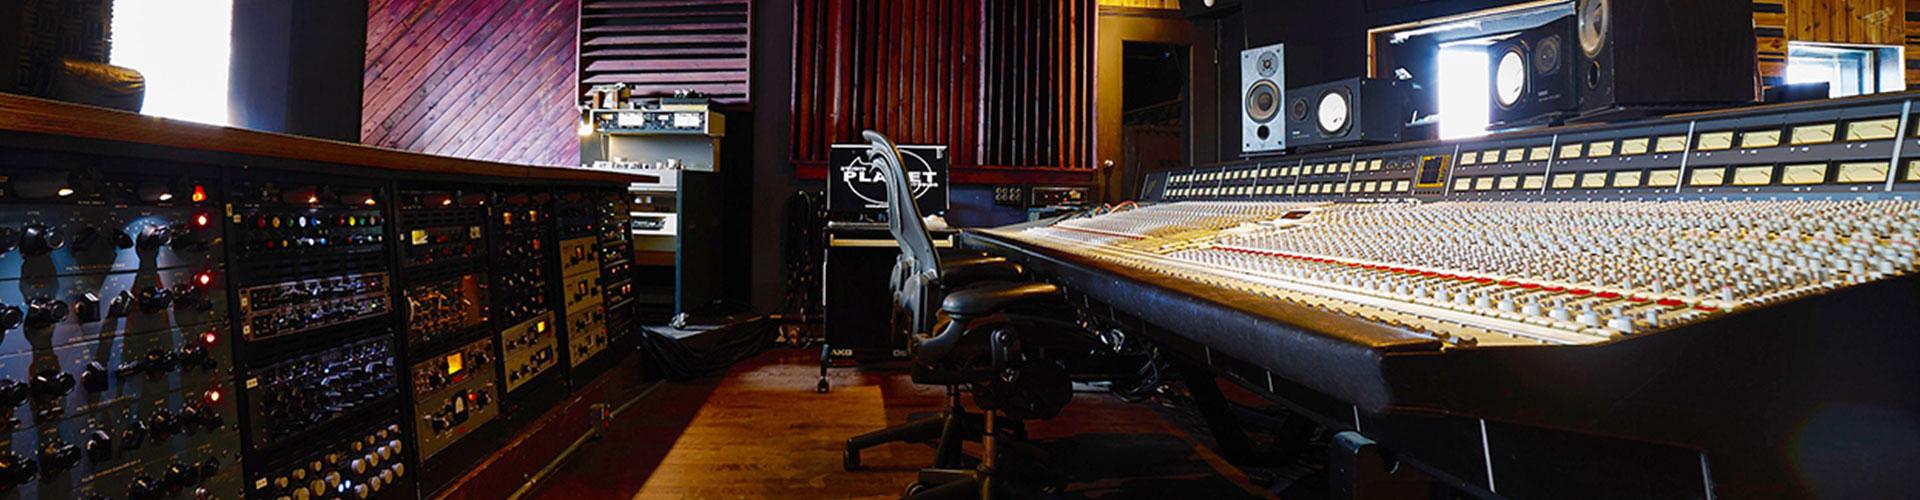 Funktasy Mix Studio